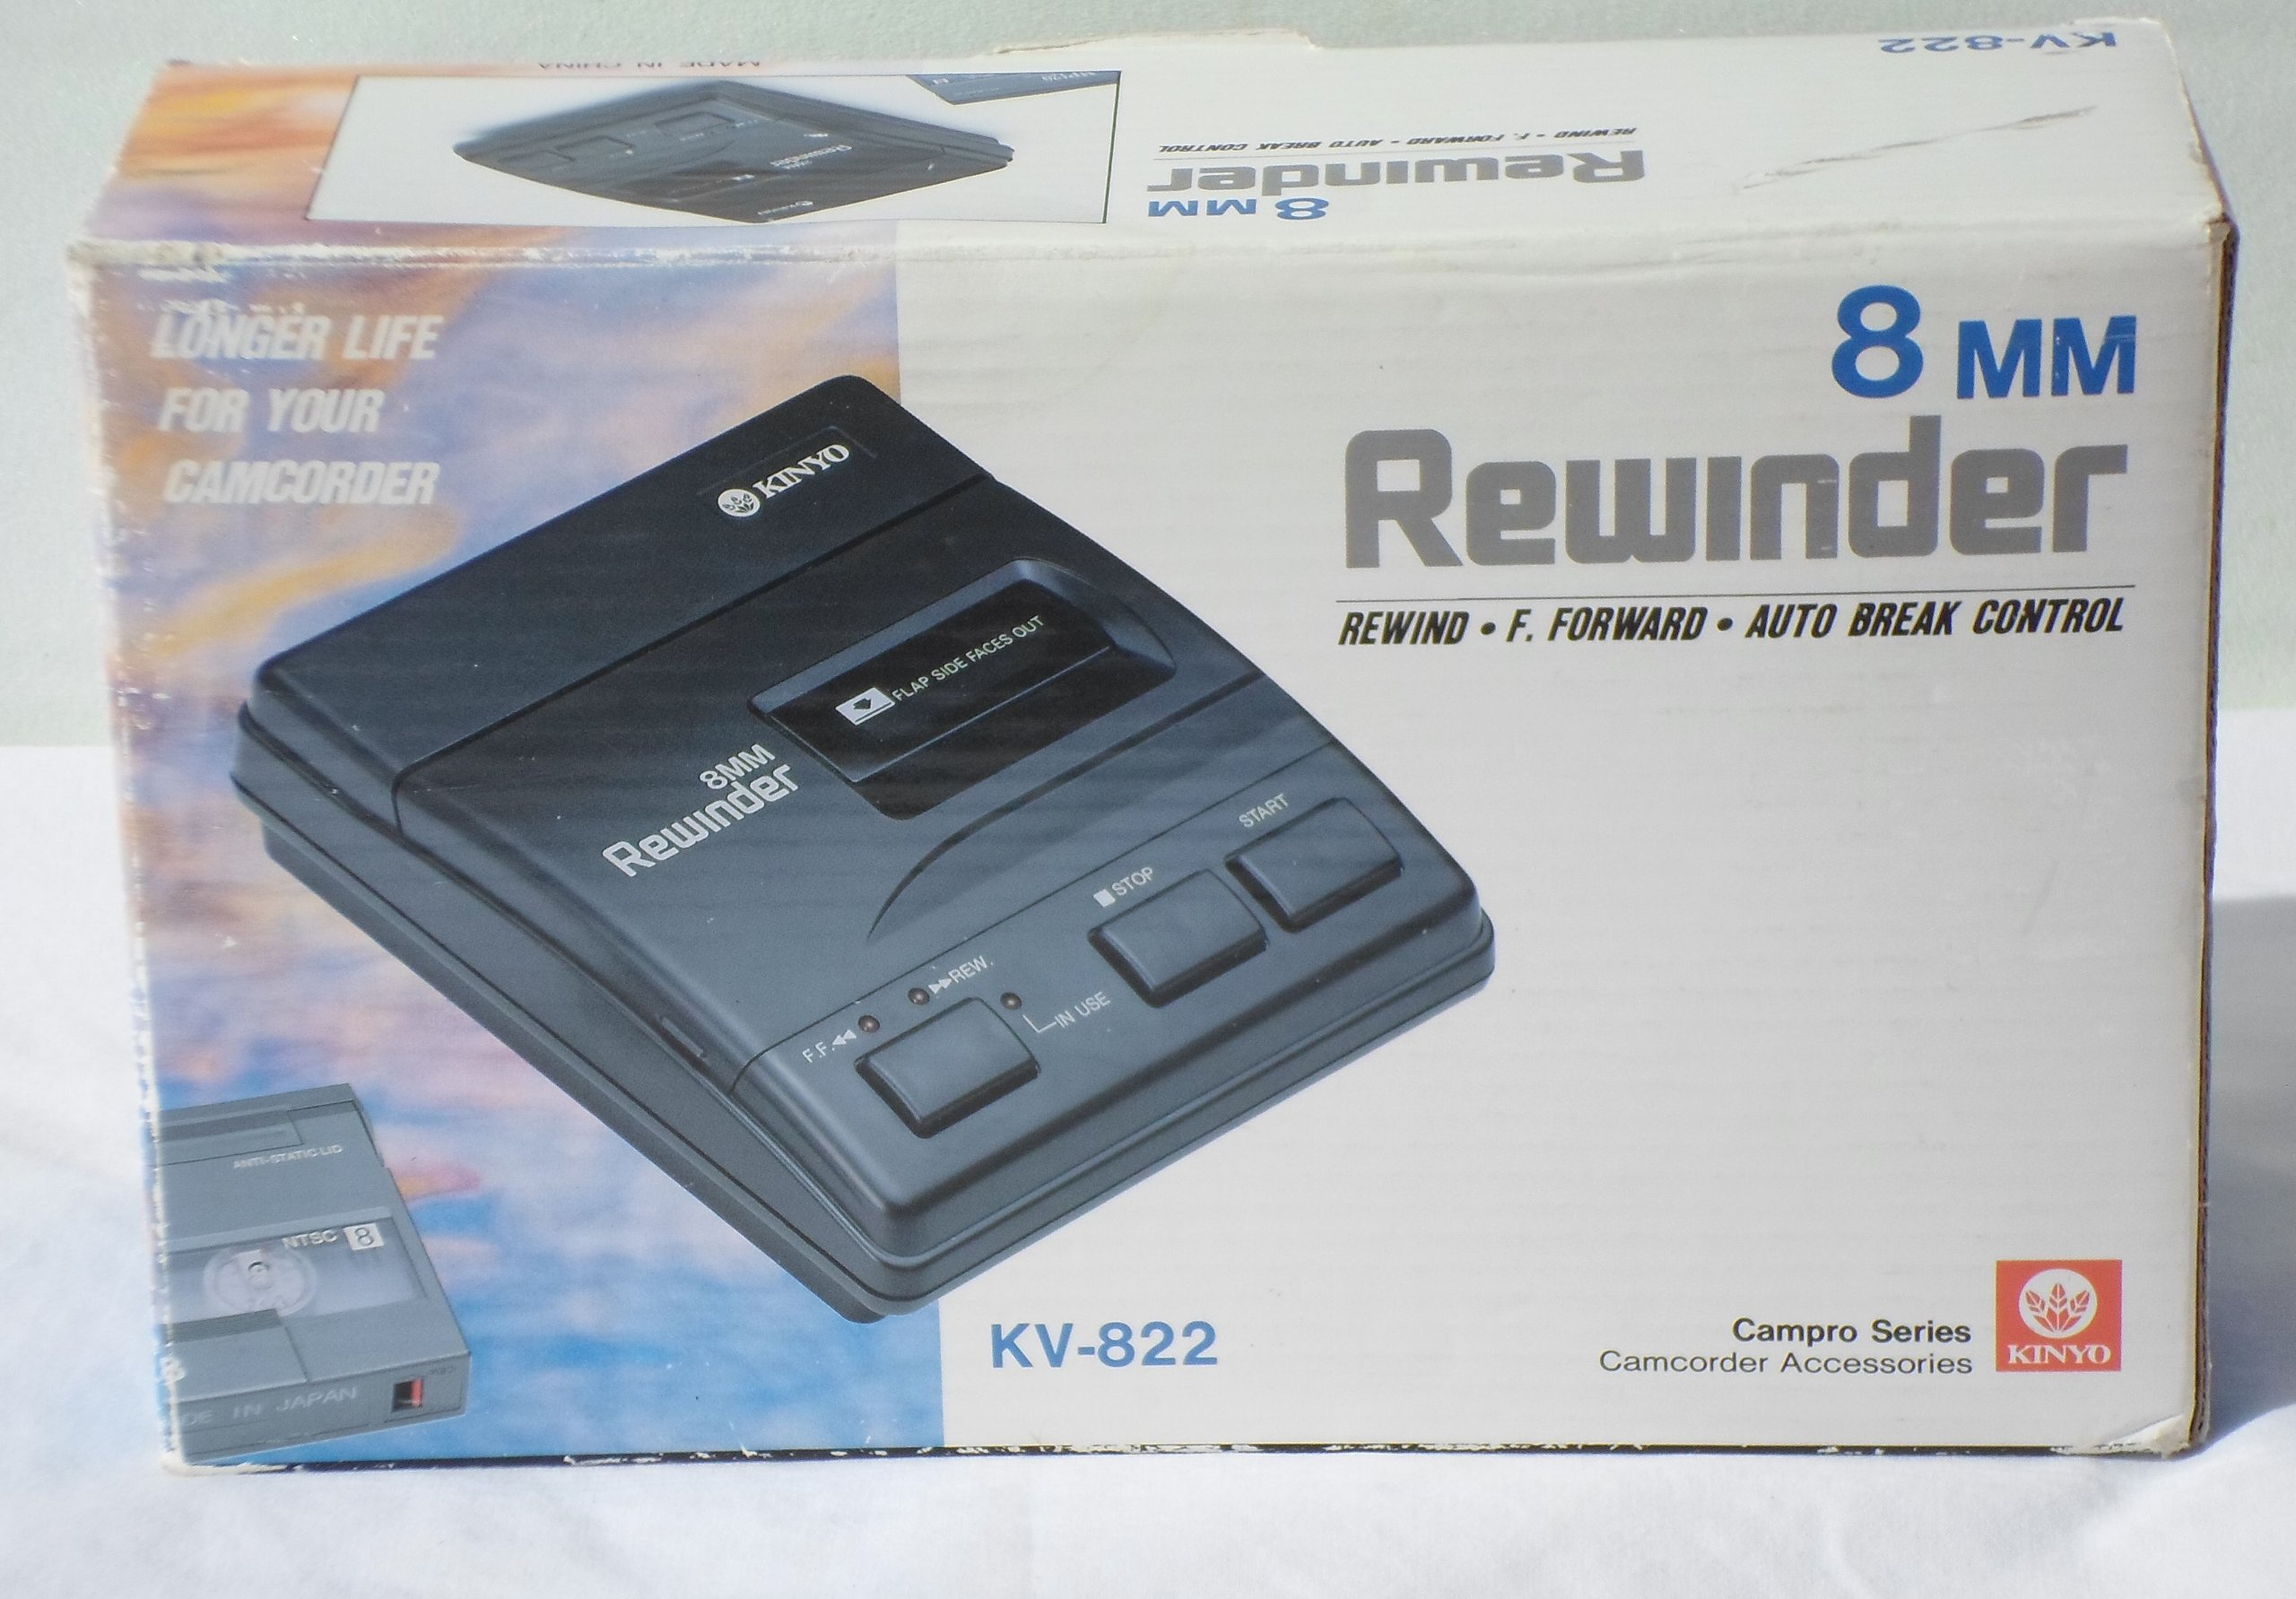 KINYO KV-822 2-Way 8mm Rewinder